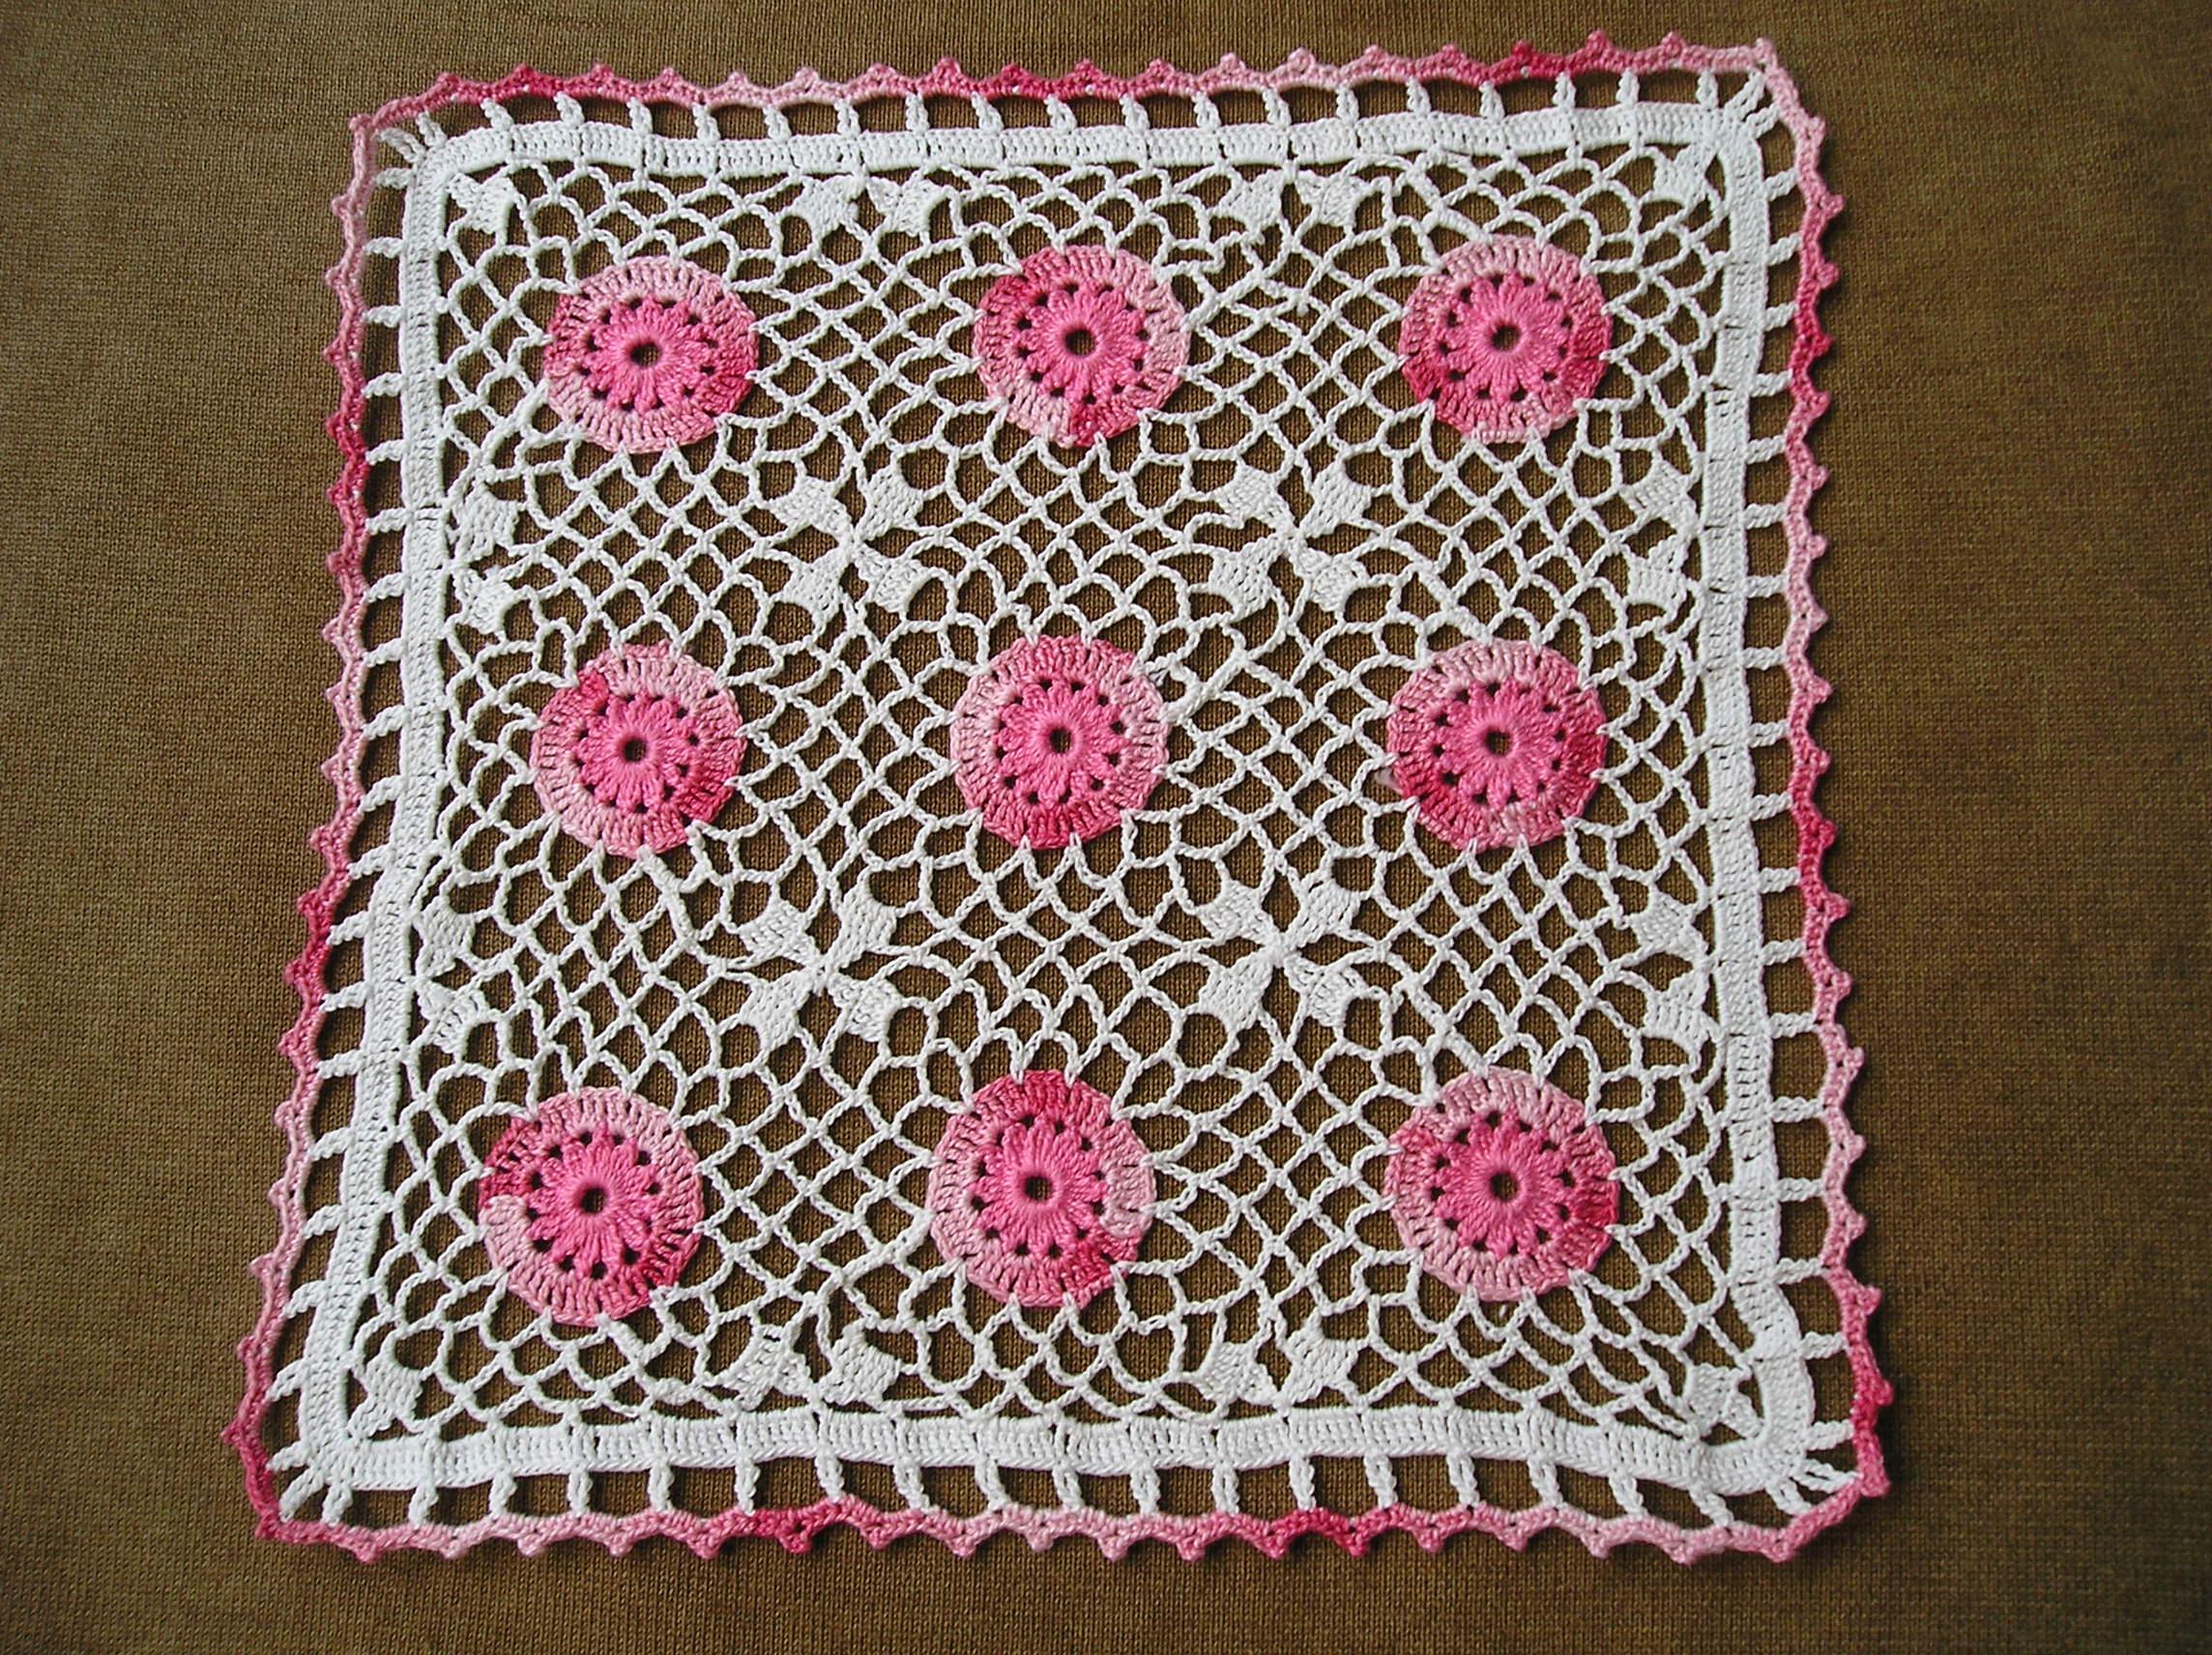 Fotos gratis : Ganchillo, rosado, tejer, mantelito, textil, costura ...